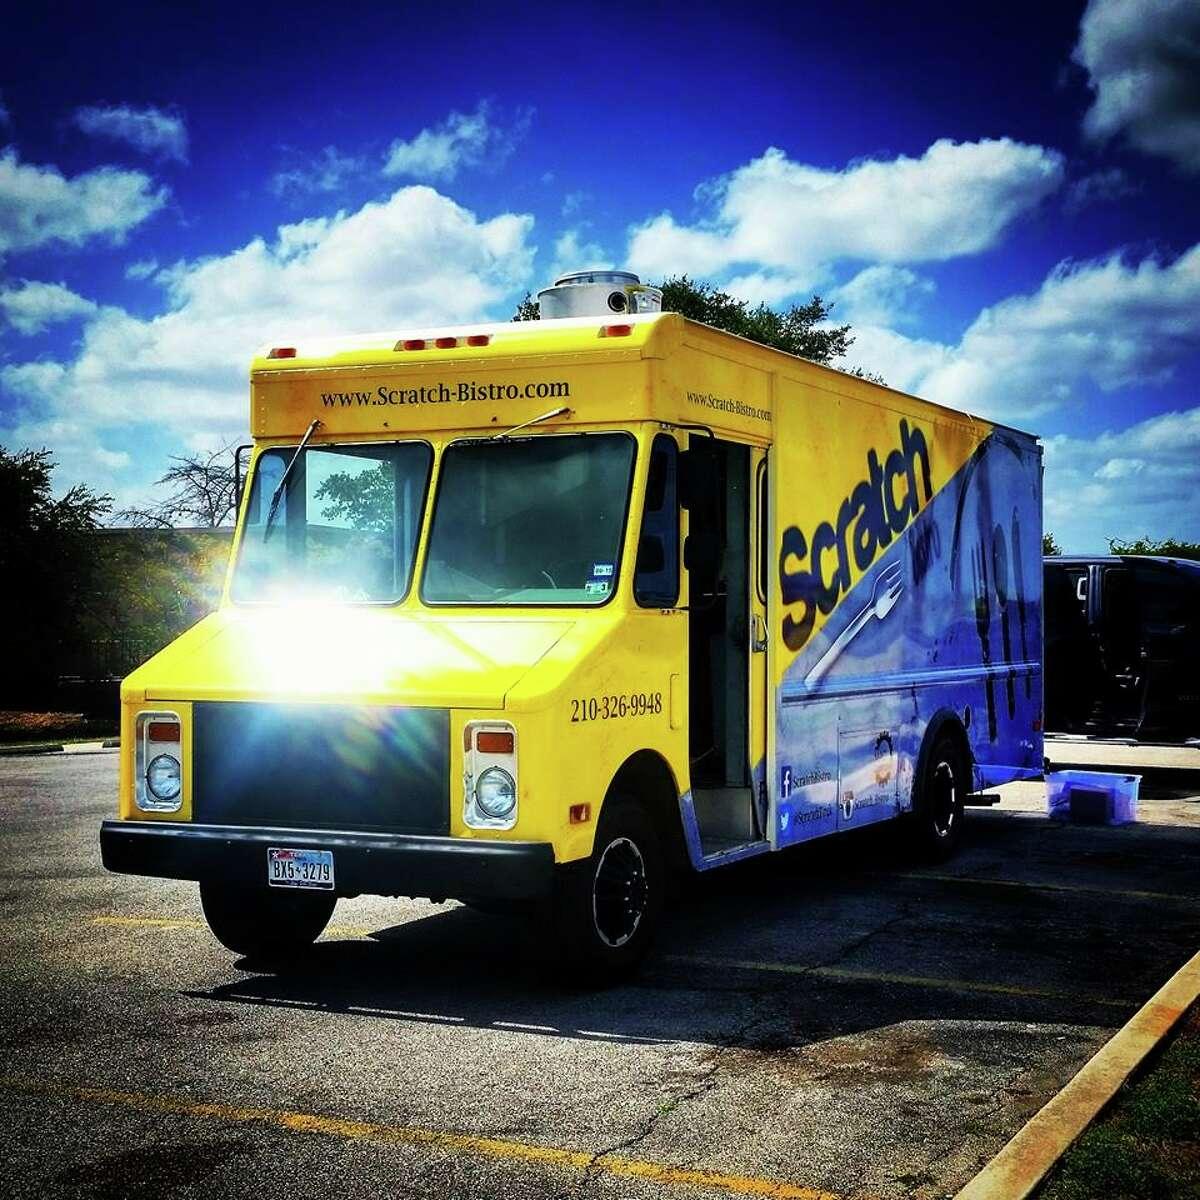 Scratch Bistro food truck